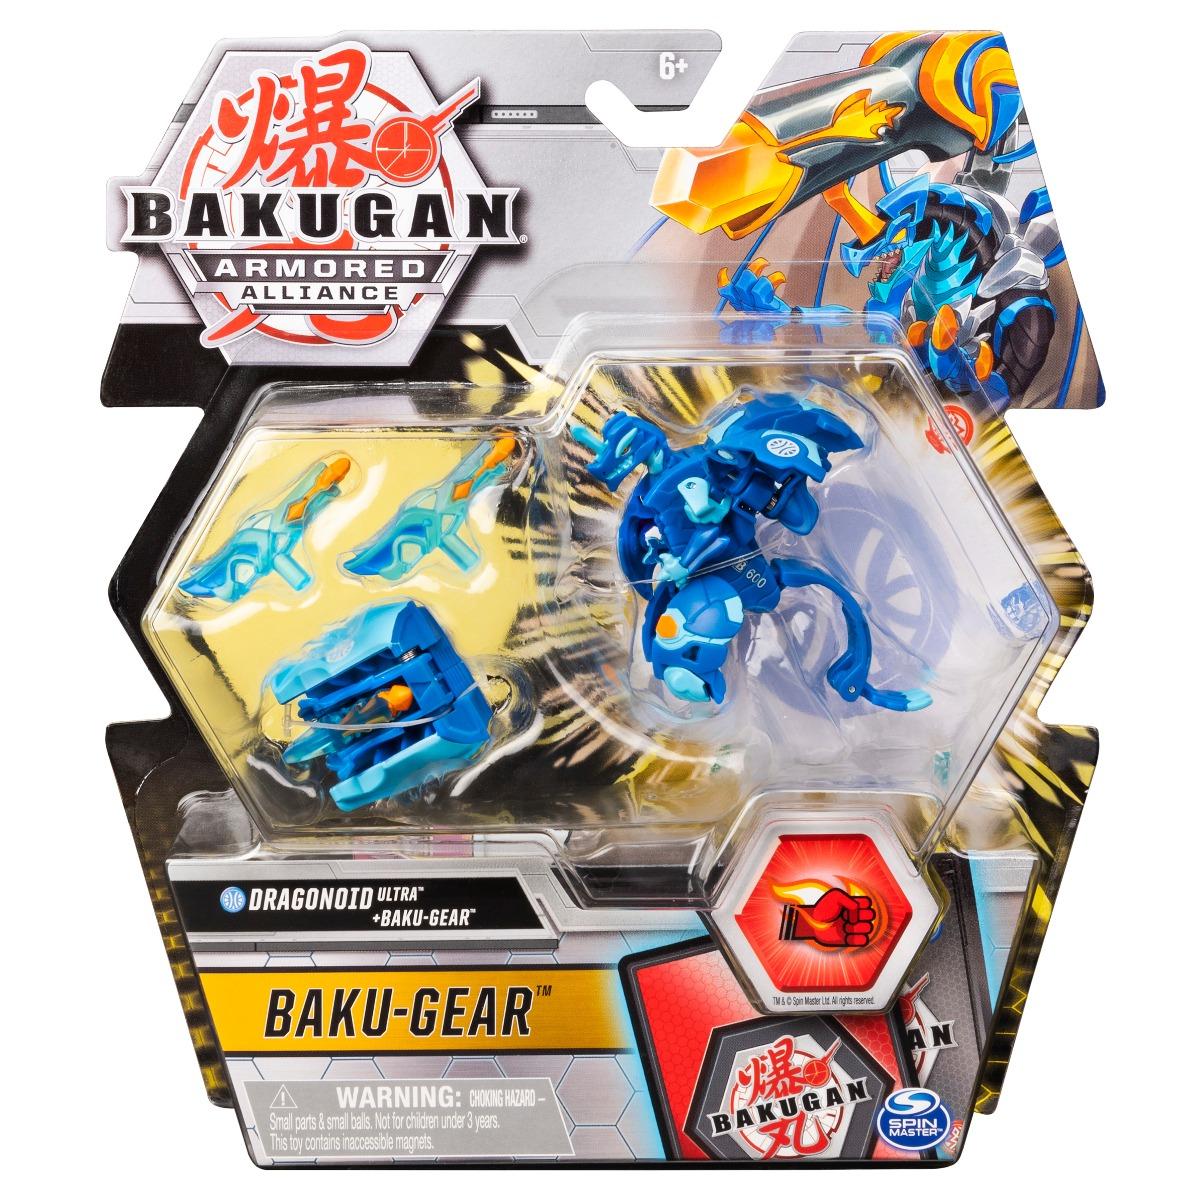 Figurina Bakugan Armored Alliance, Dragonoid Ultra, Baku-Gear 20124089 imagine